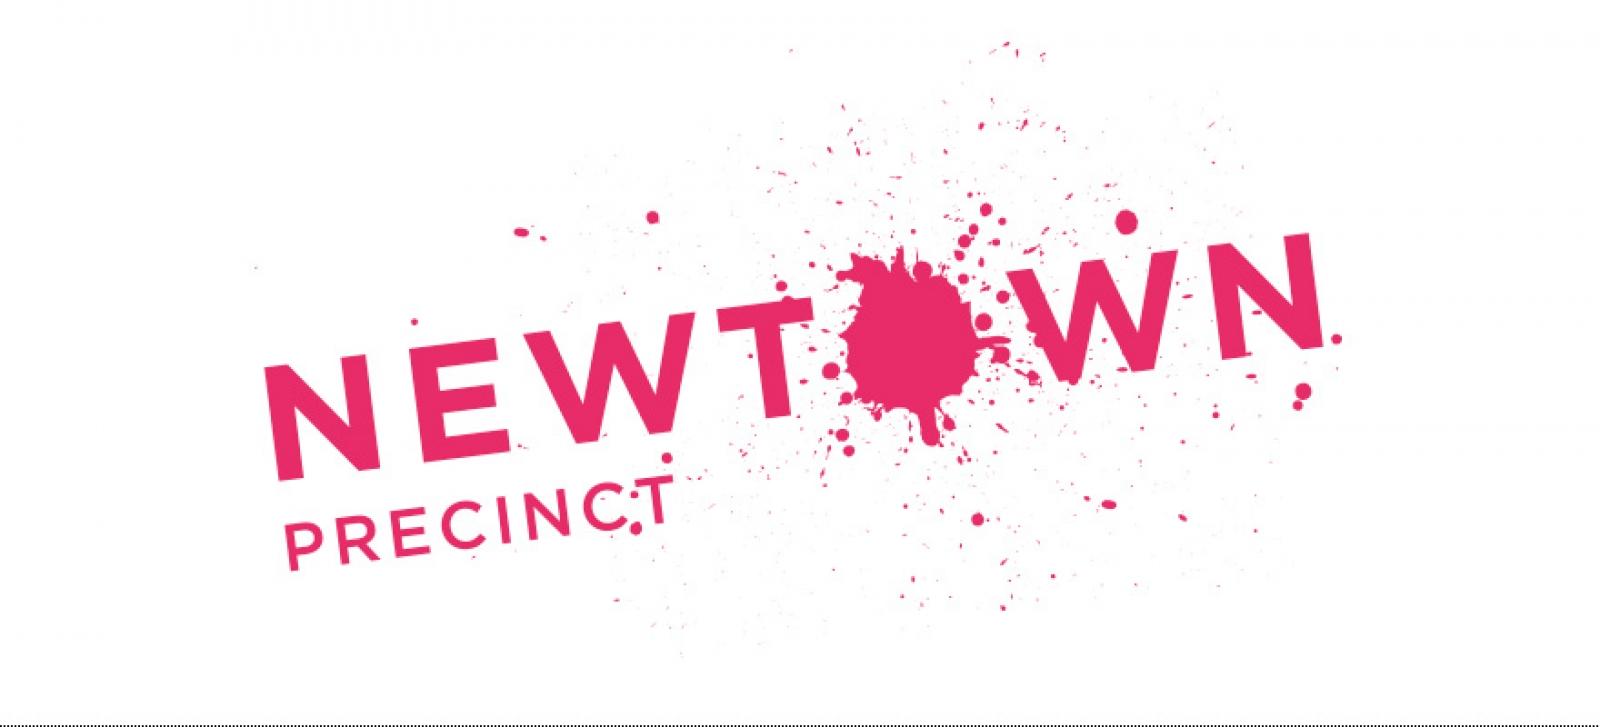 Newtown Precinct